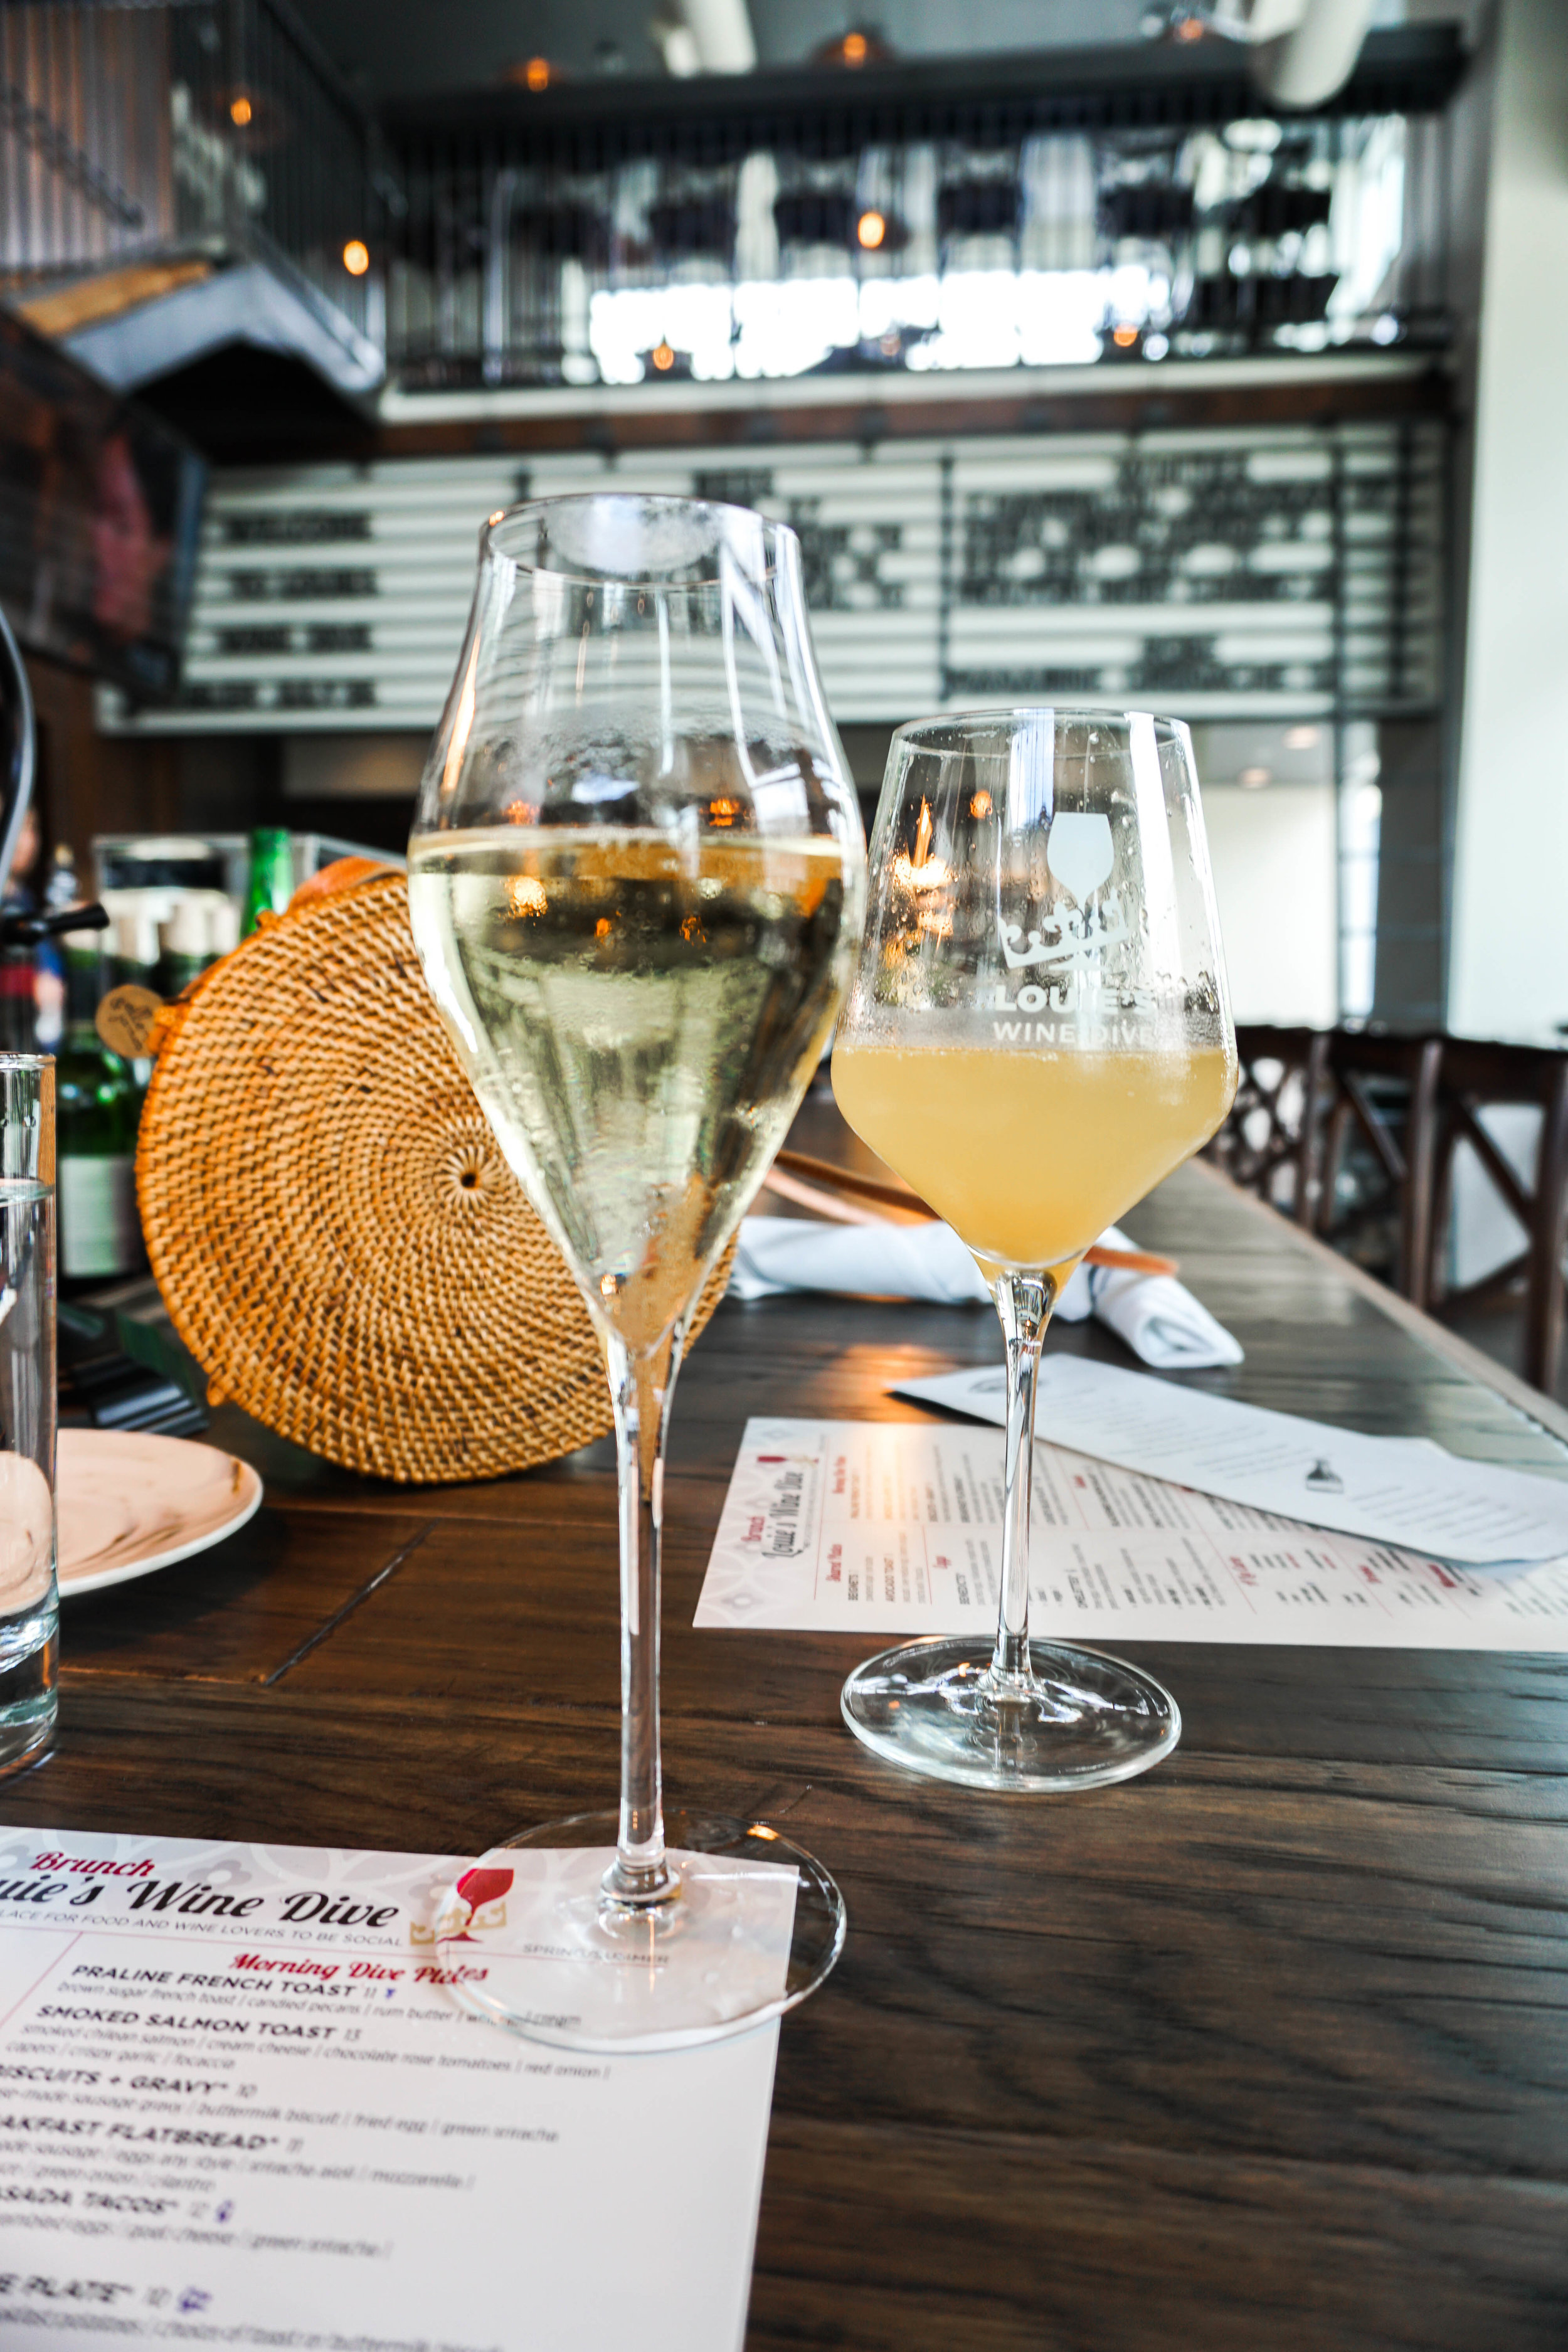 louies-wine-bar-brunch-midtown-the-second-muse.jpg